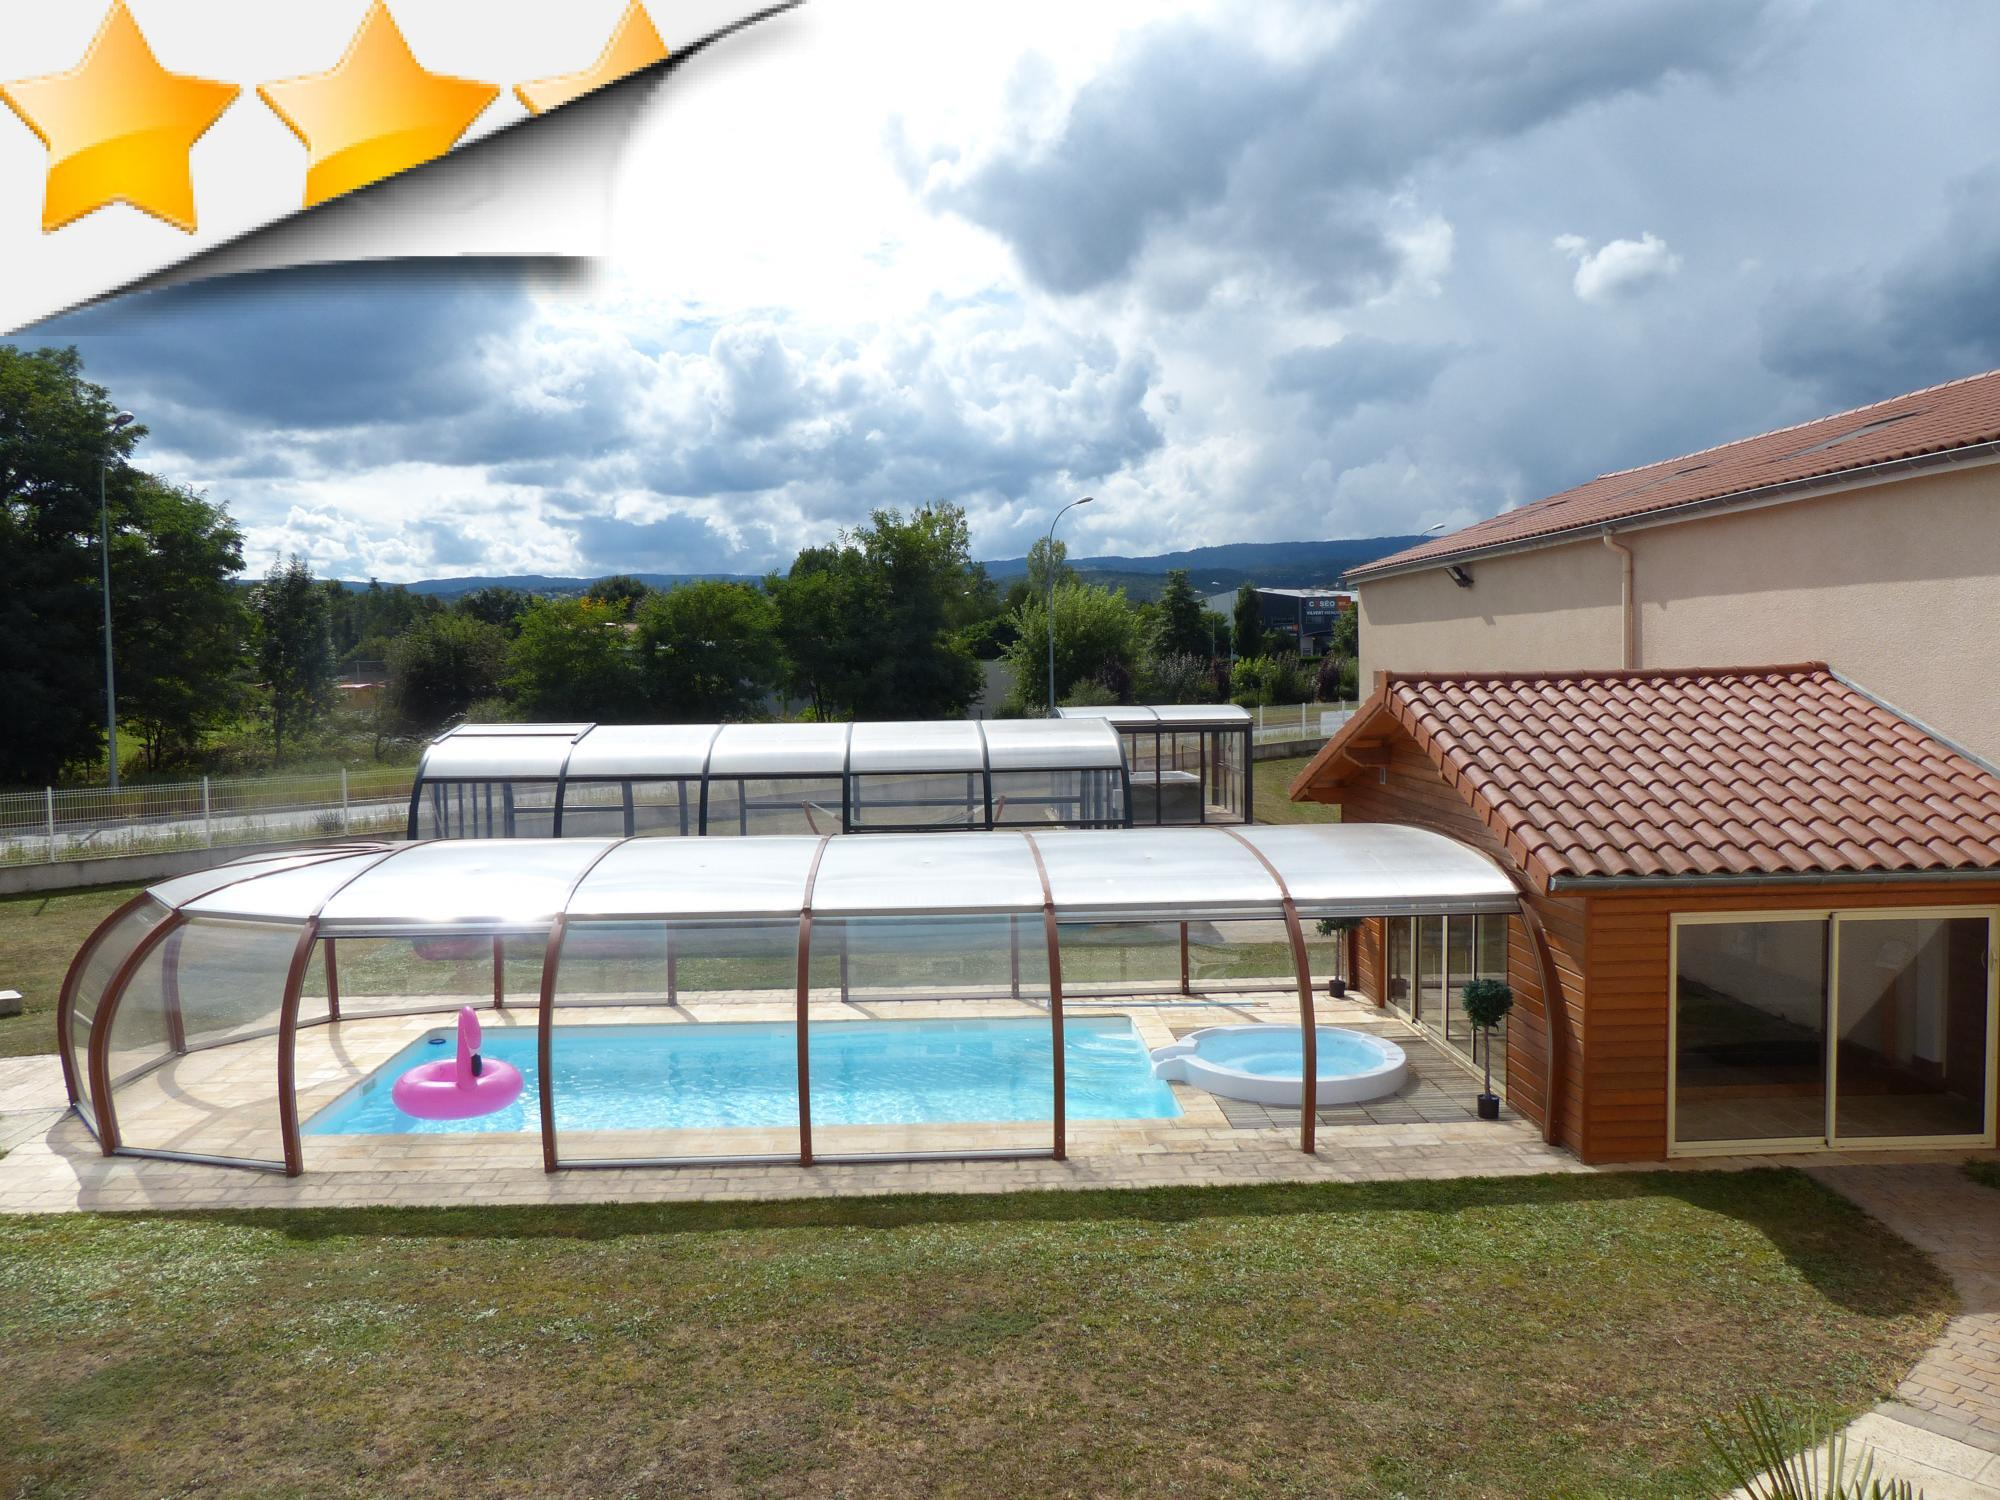 piscine d 39 occasion promotion par lpc. Black Bedroom Furniture Sets. Home Design Ideas